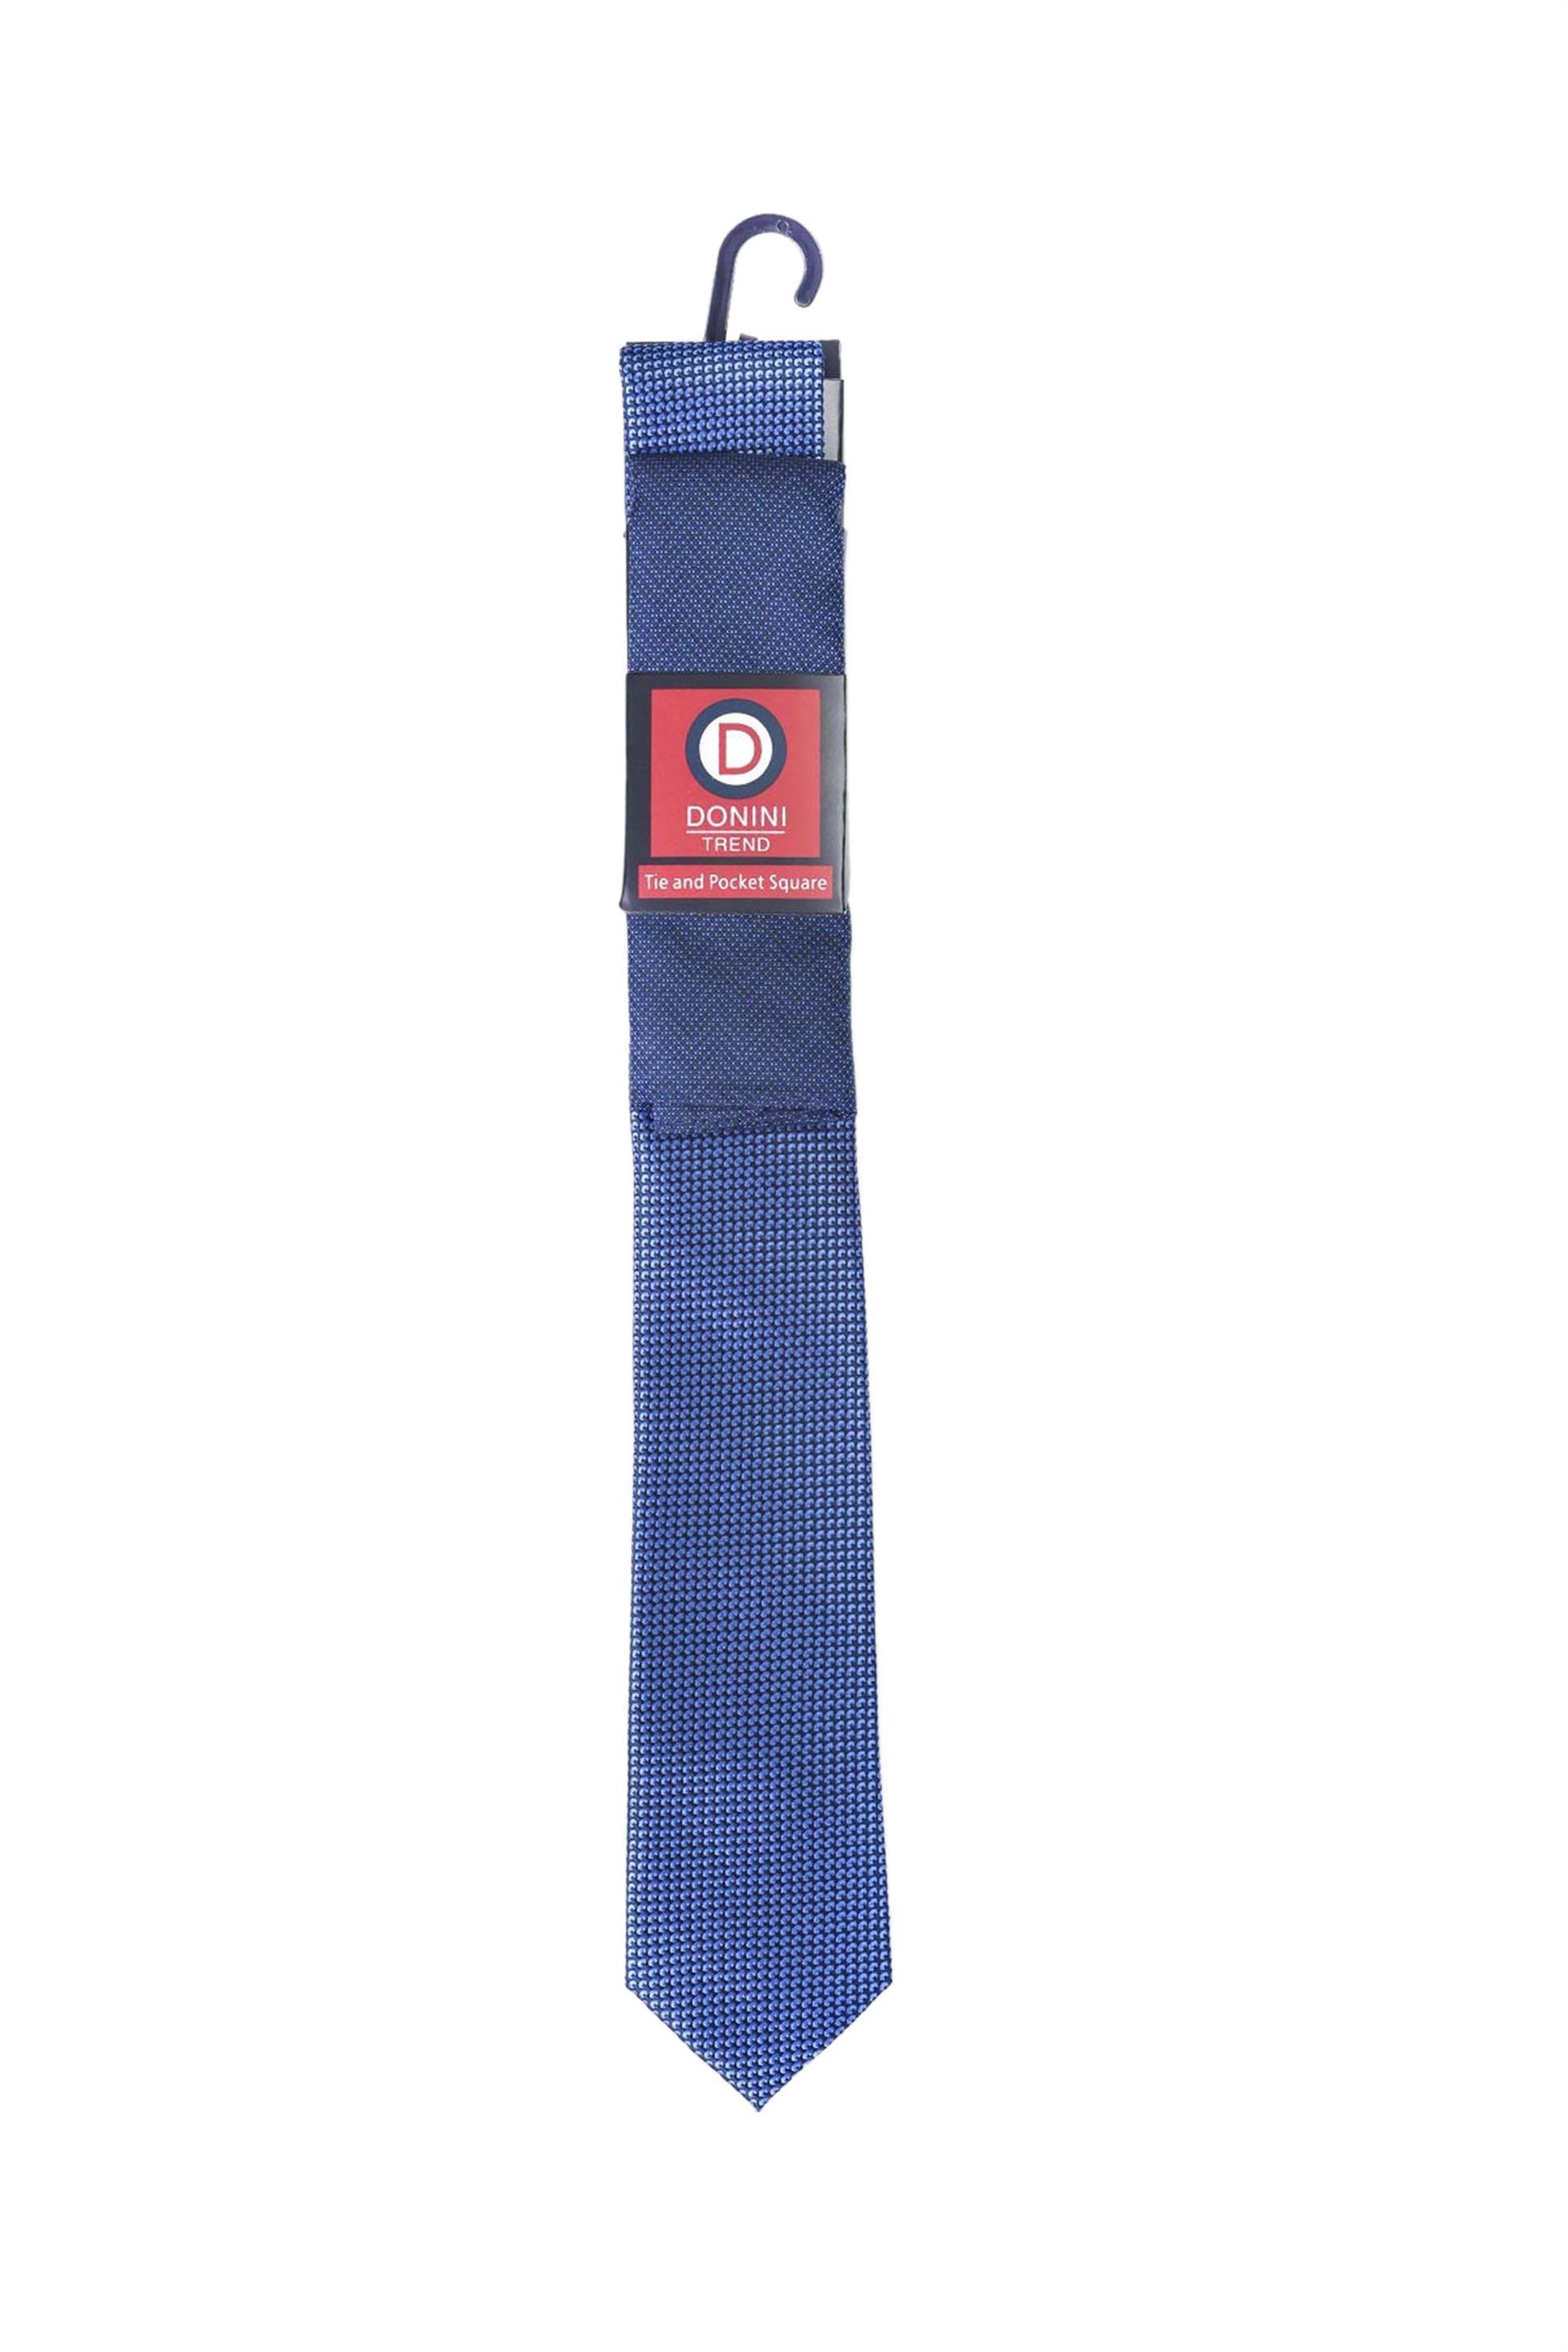 Vardas ανδρικό σετ γραβάτα και μαντηλάκι - 2062000380101 - Μπλε